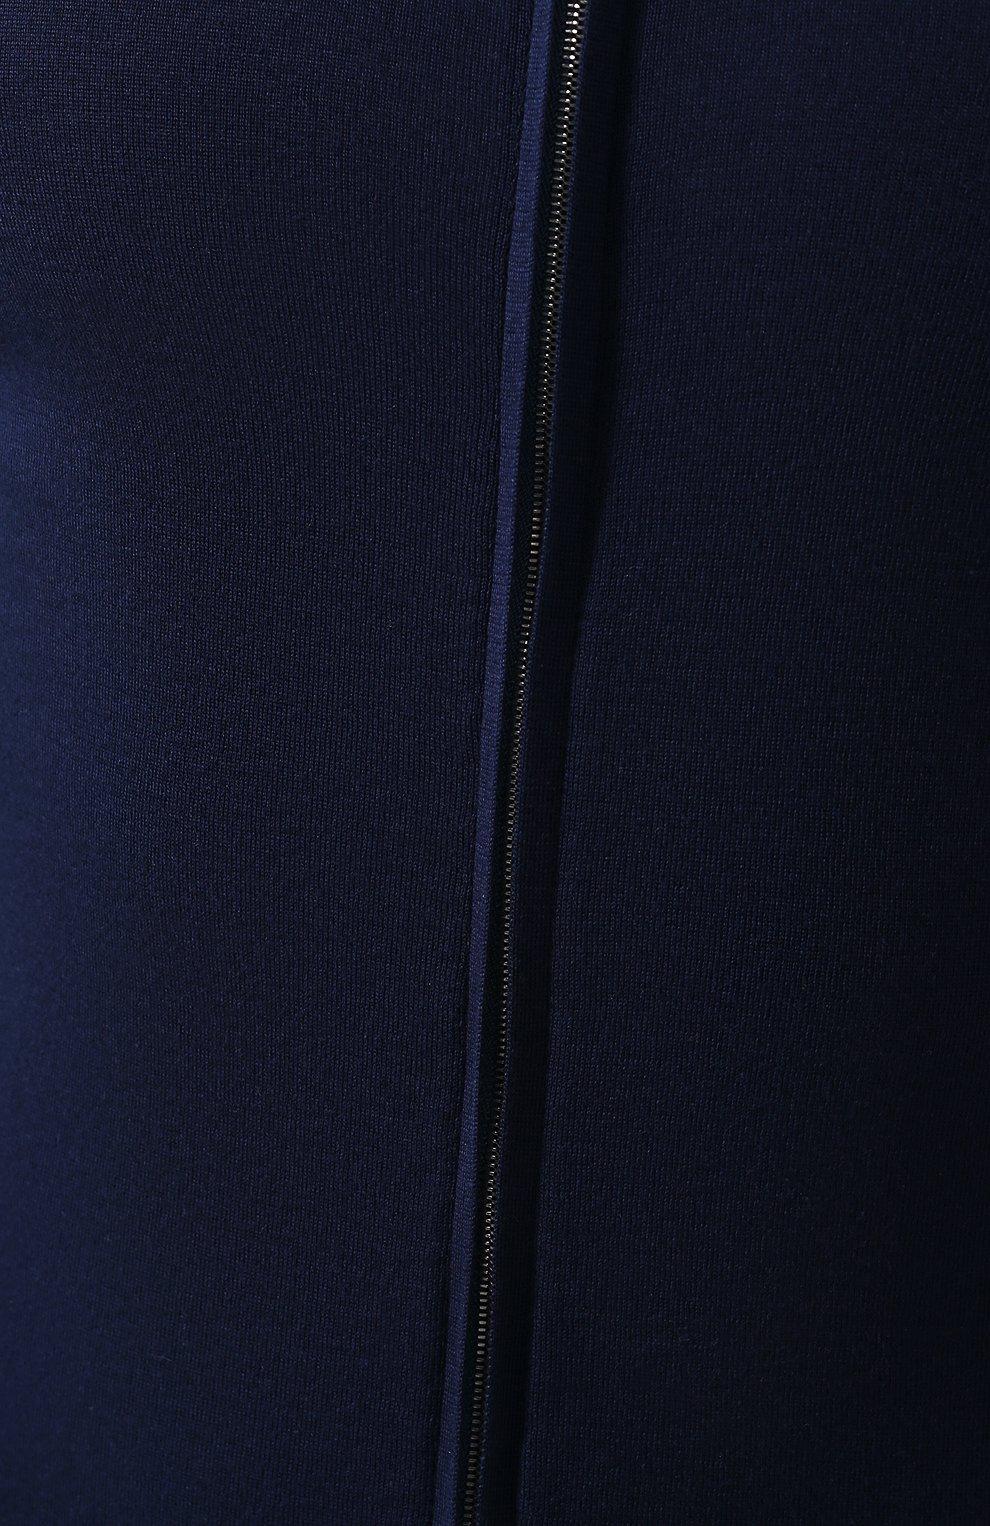 Хлопковый кардиган Svevo темно-синий | Фото №5